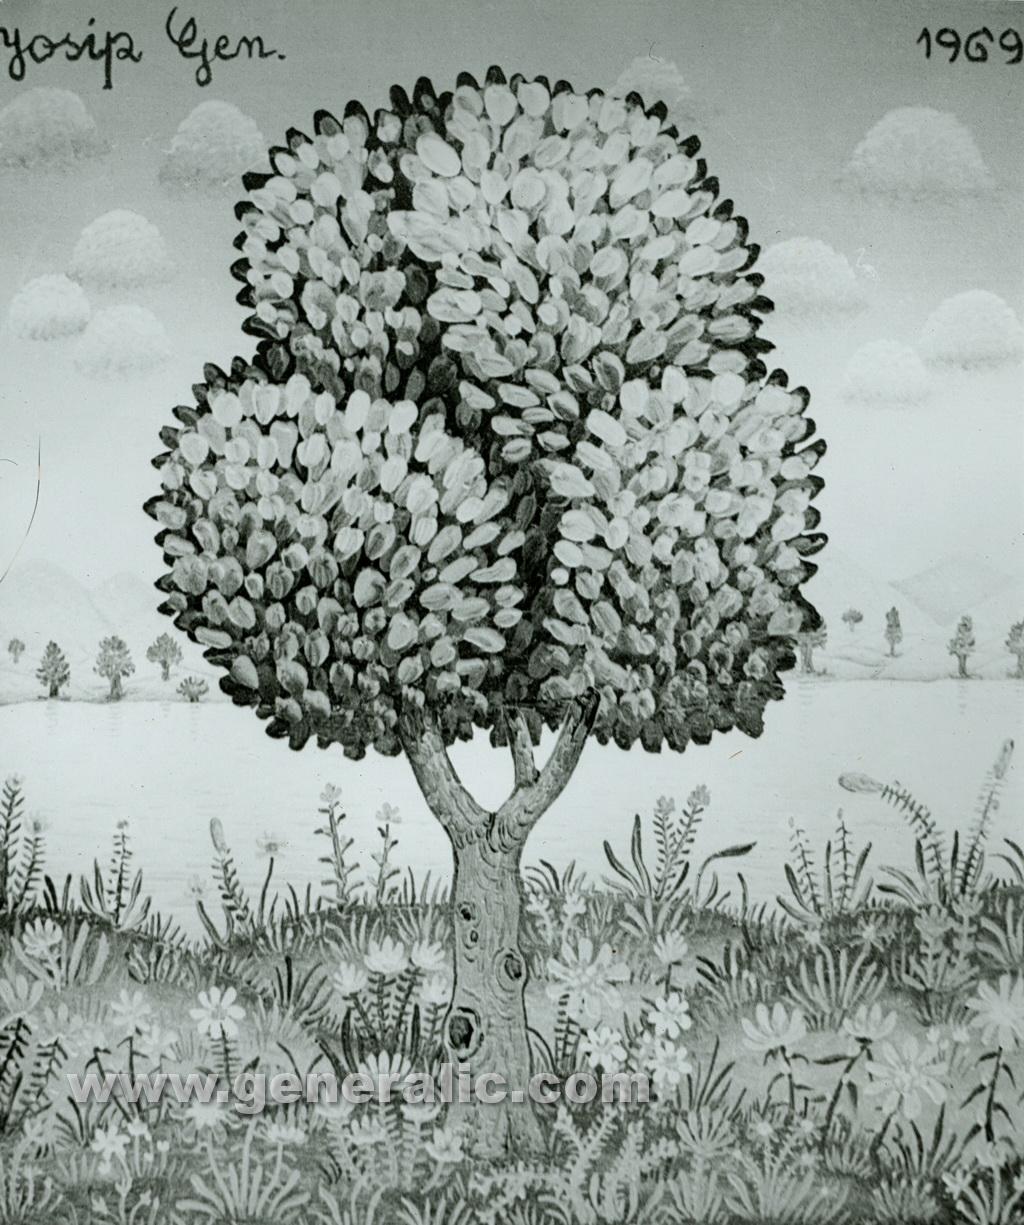 Josip Generalic, 1969, A tree, oil on canvas